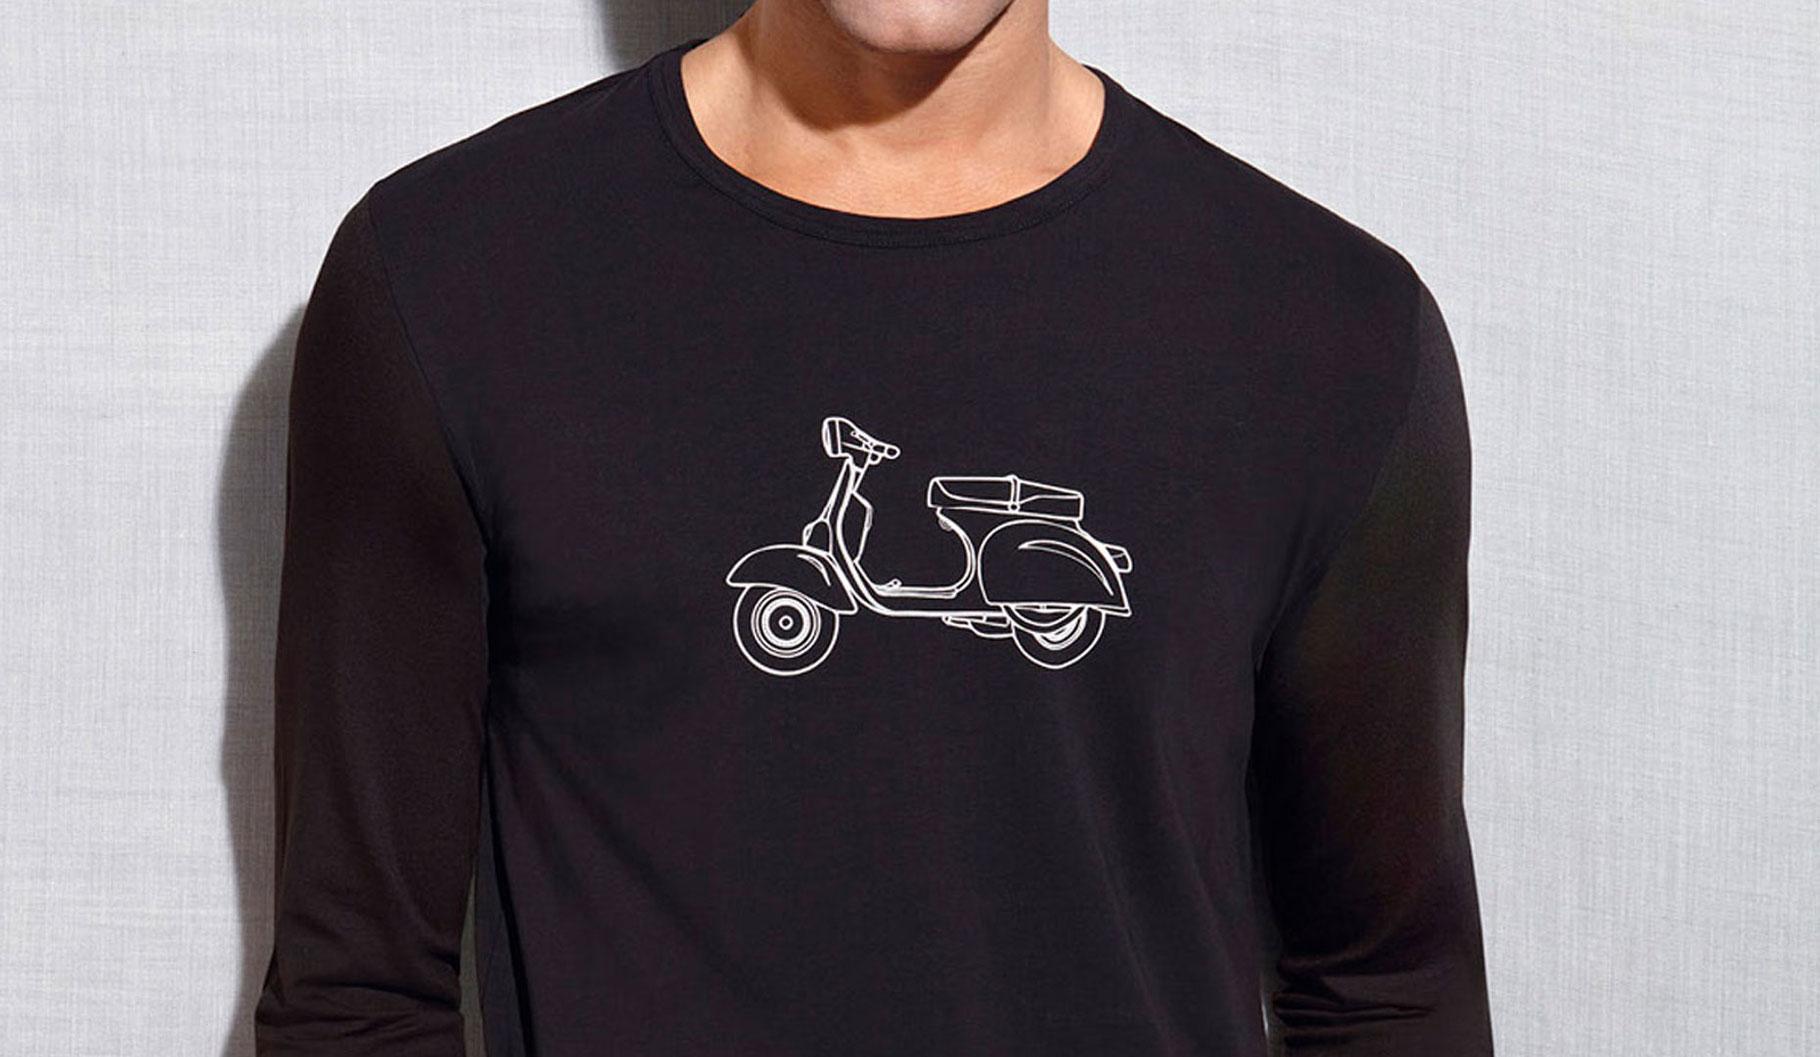 promo code 875b9 0818a Perofl T-Shirt Uomo